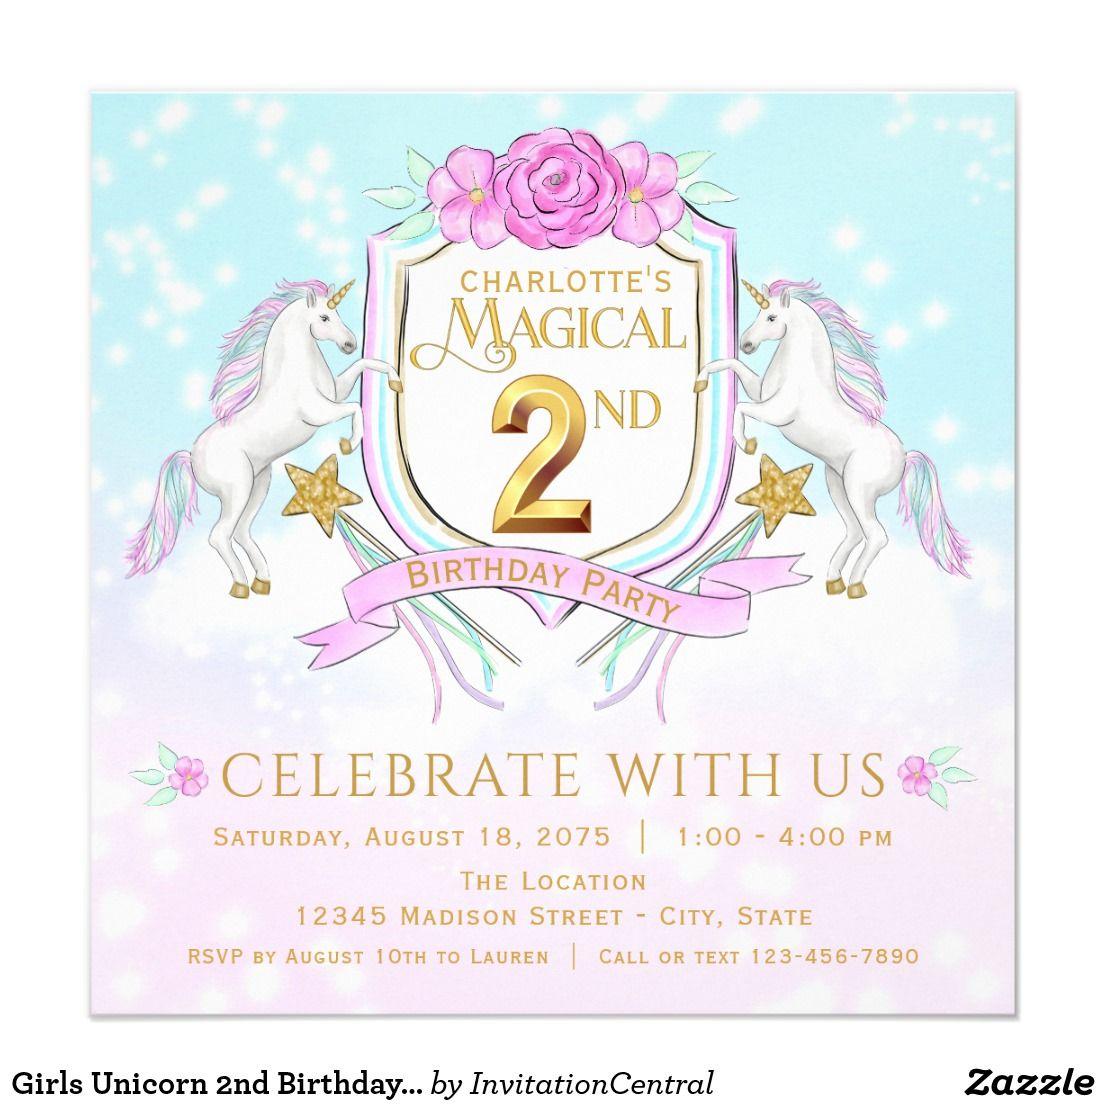 Girls Unicorn 2nd Birthday Party Invitations